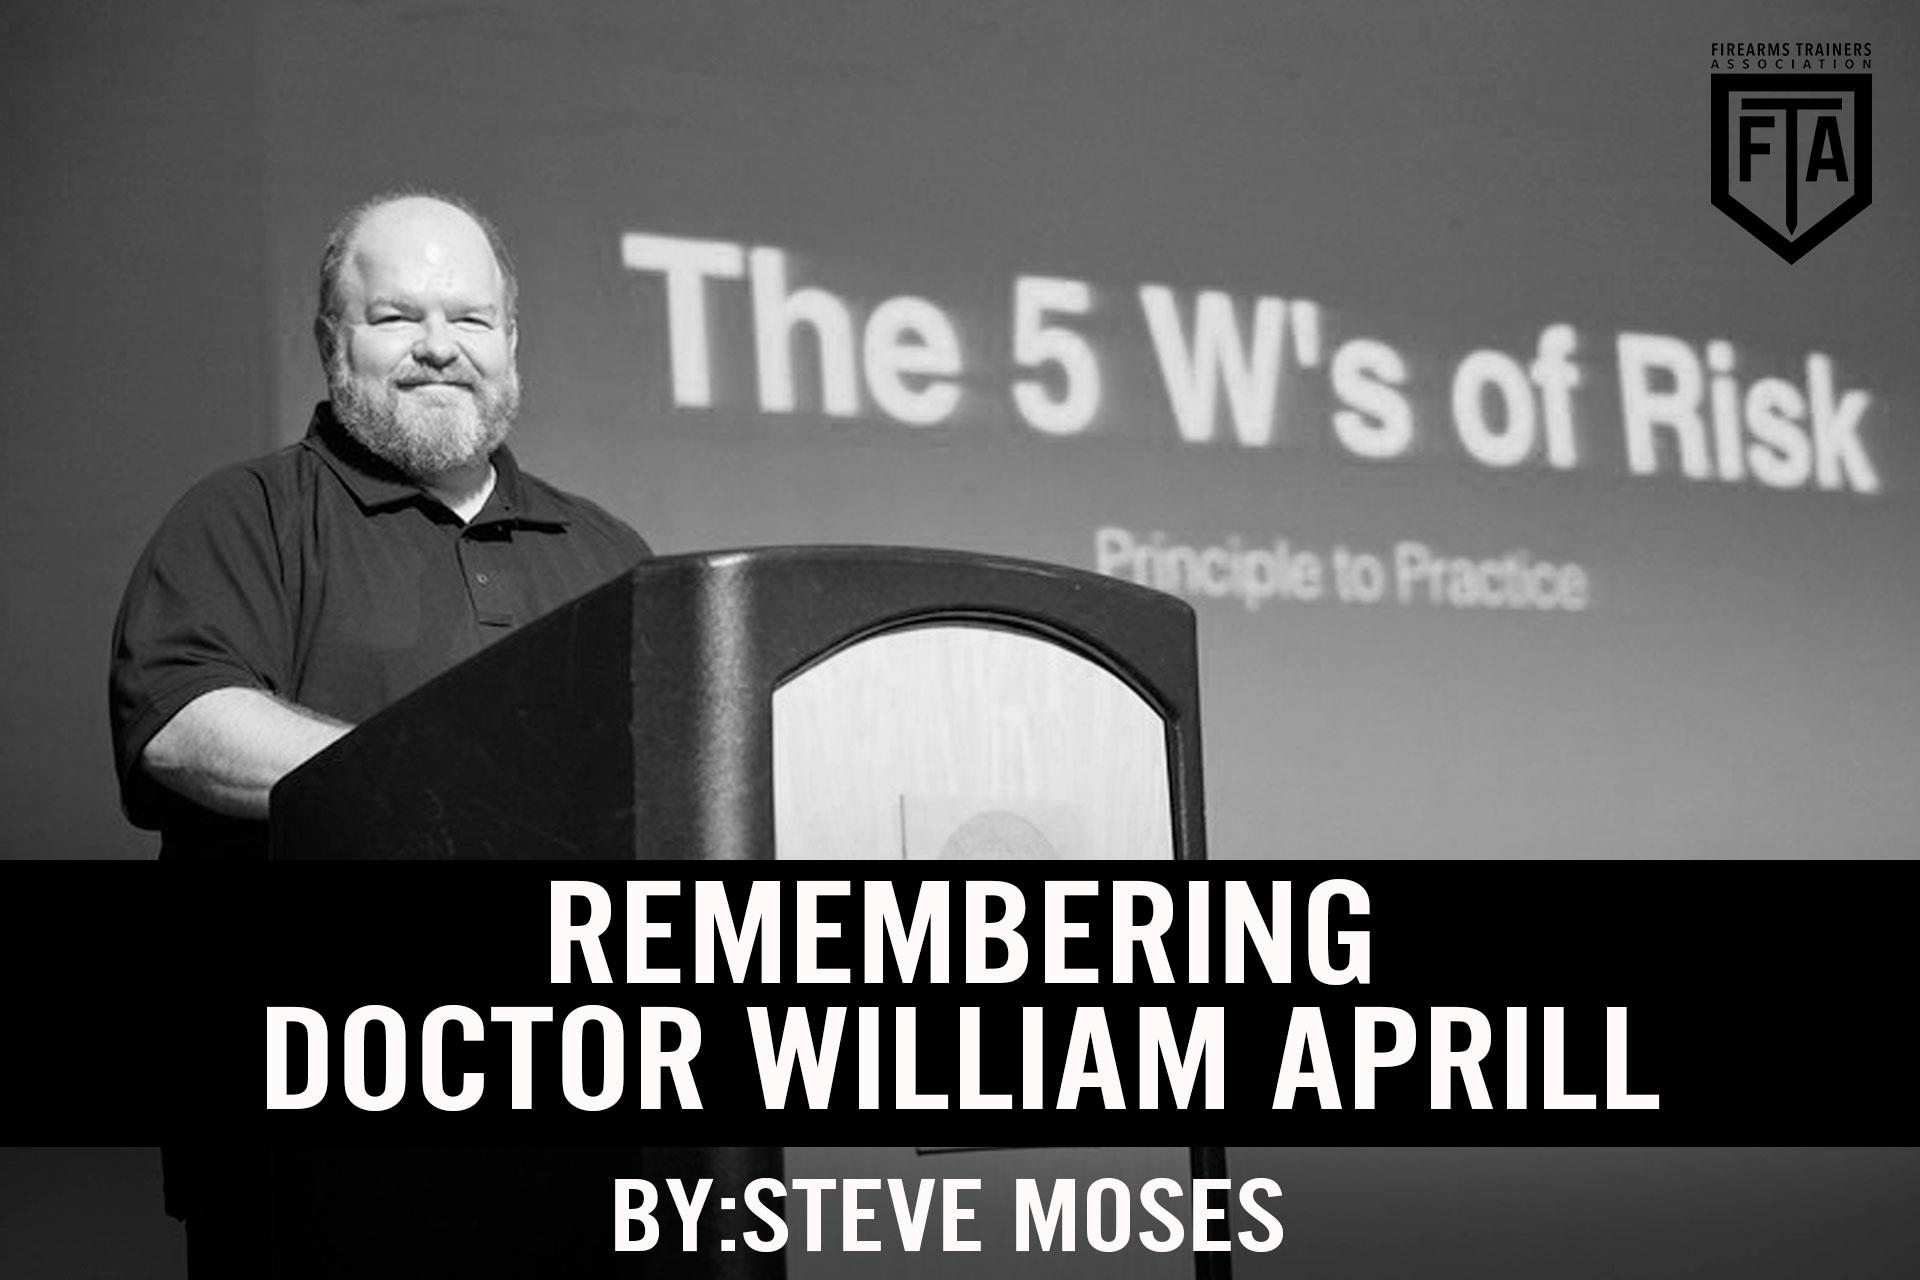 REMEMBERING DOCTOR WILLIAM APRILL